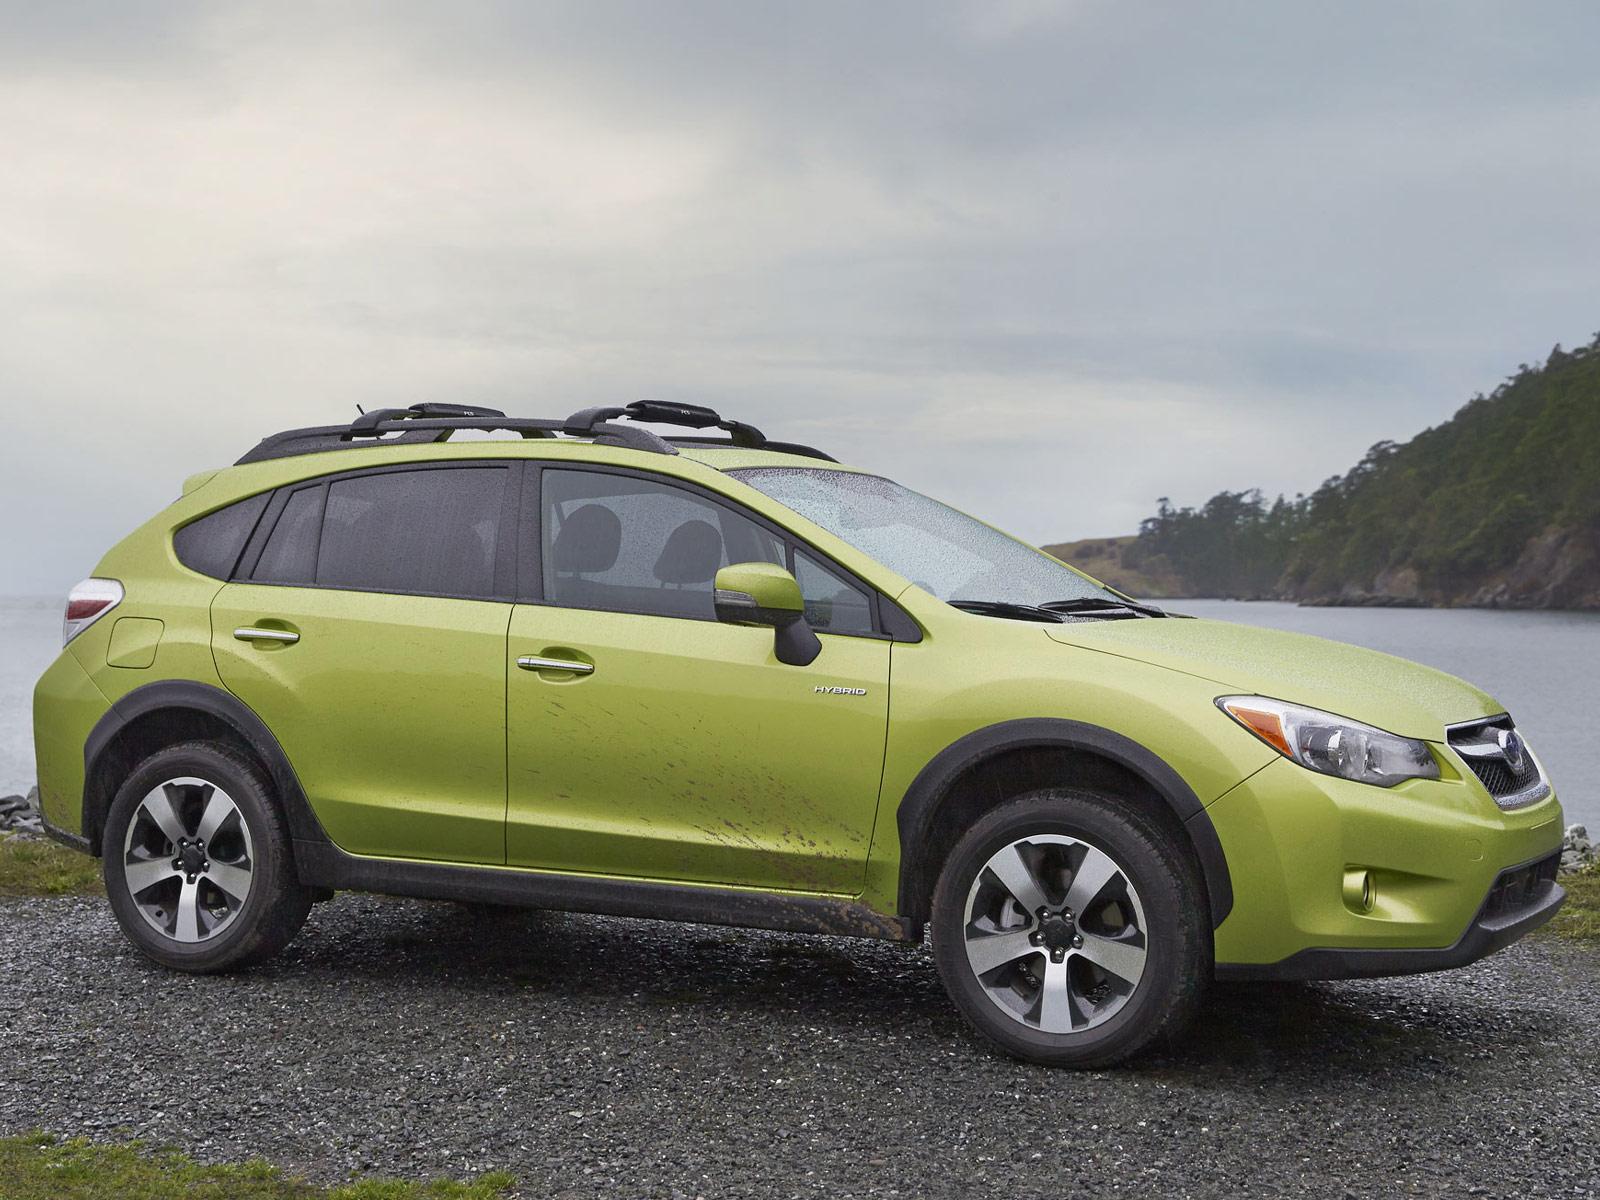 Car insurance information | 2014 Subaru XV Crosstrek Hybrid |